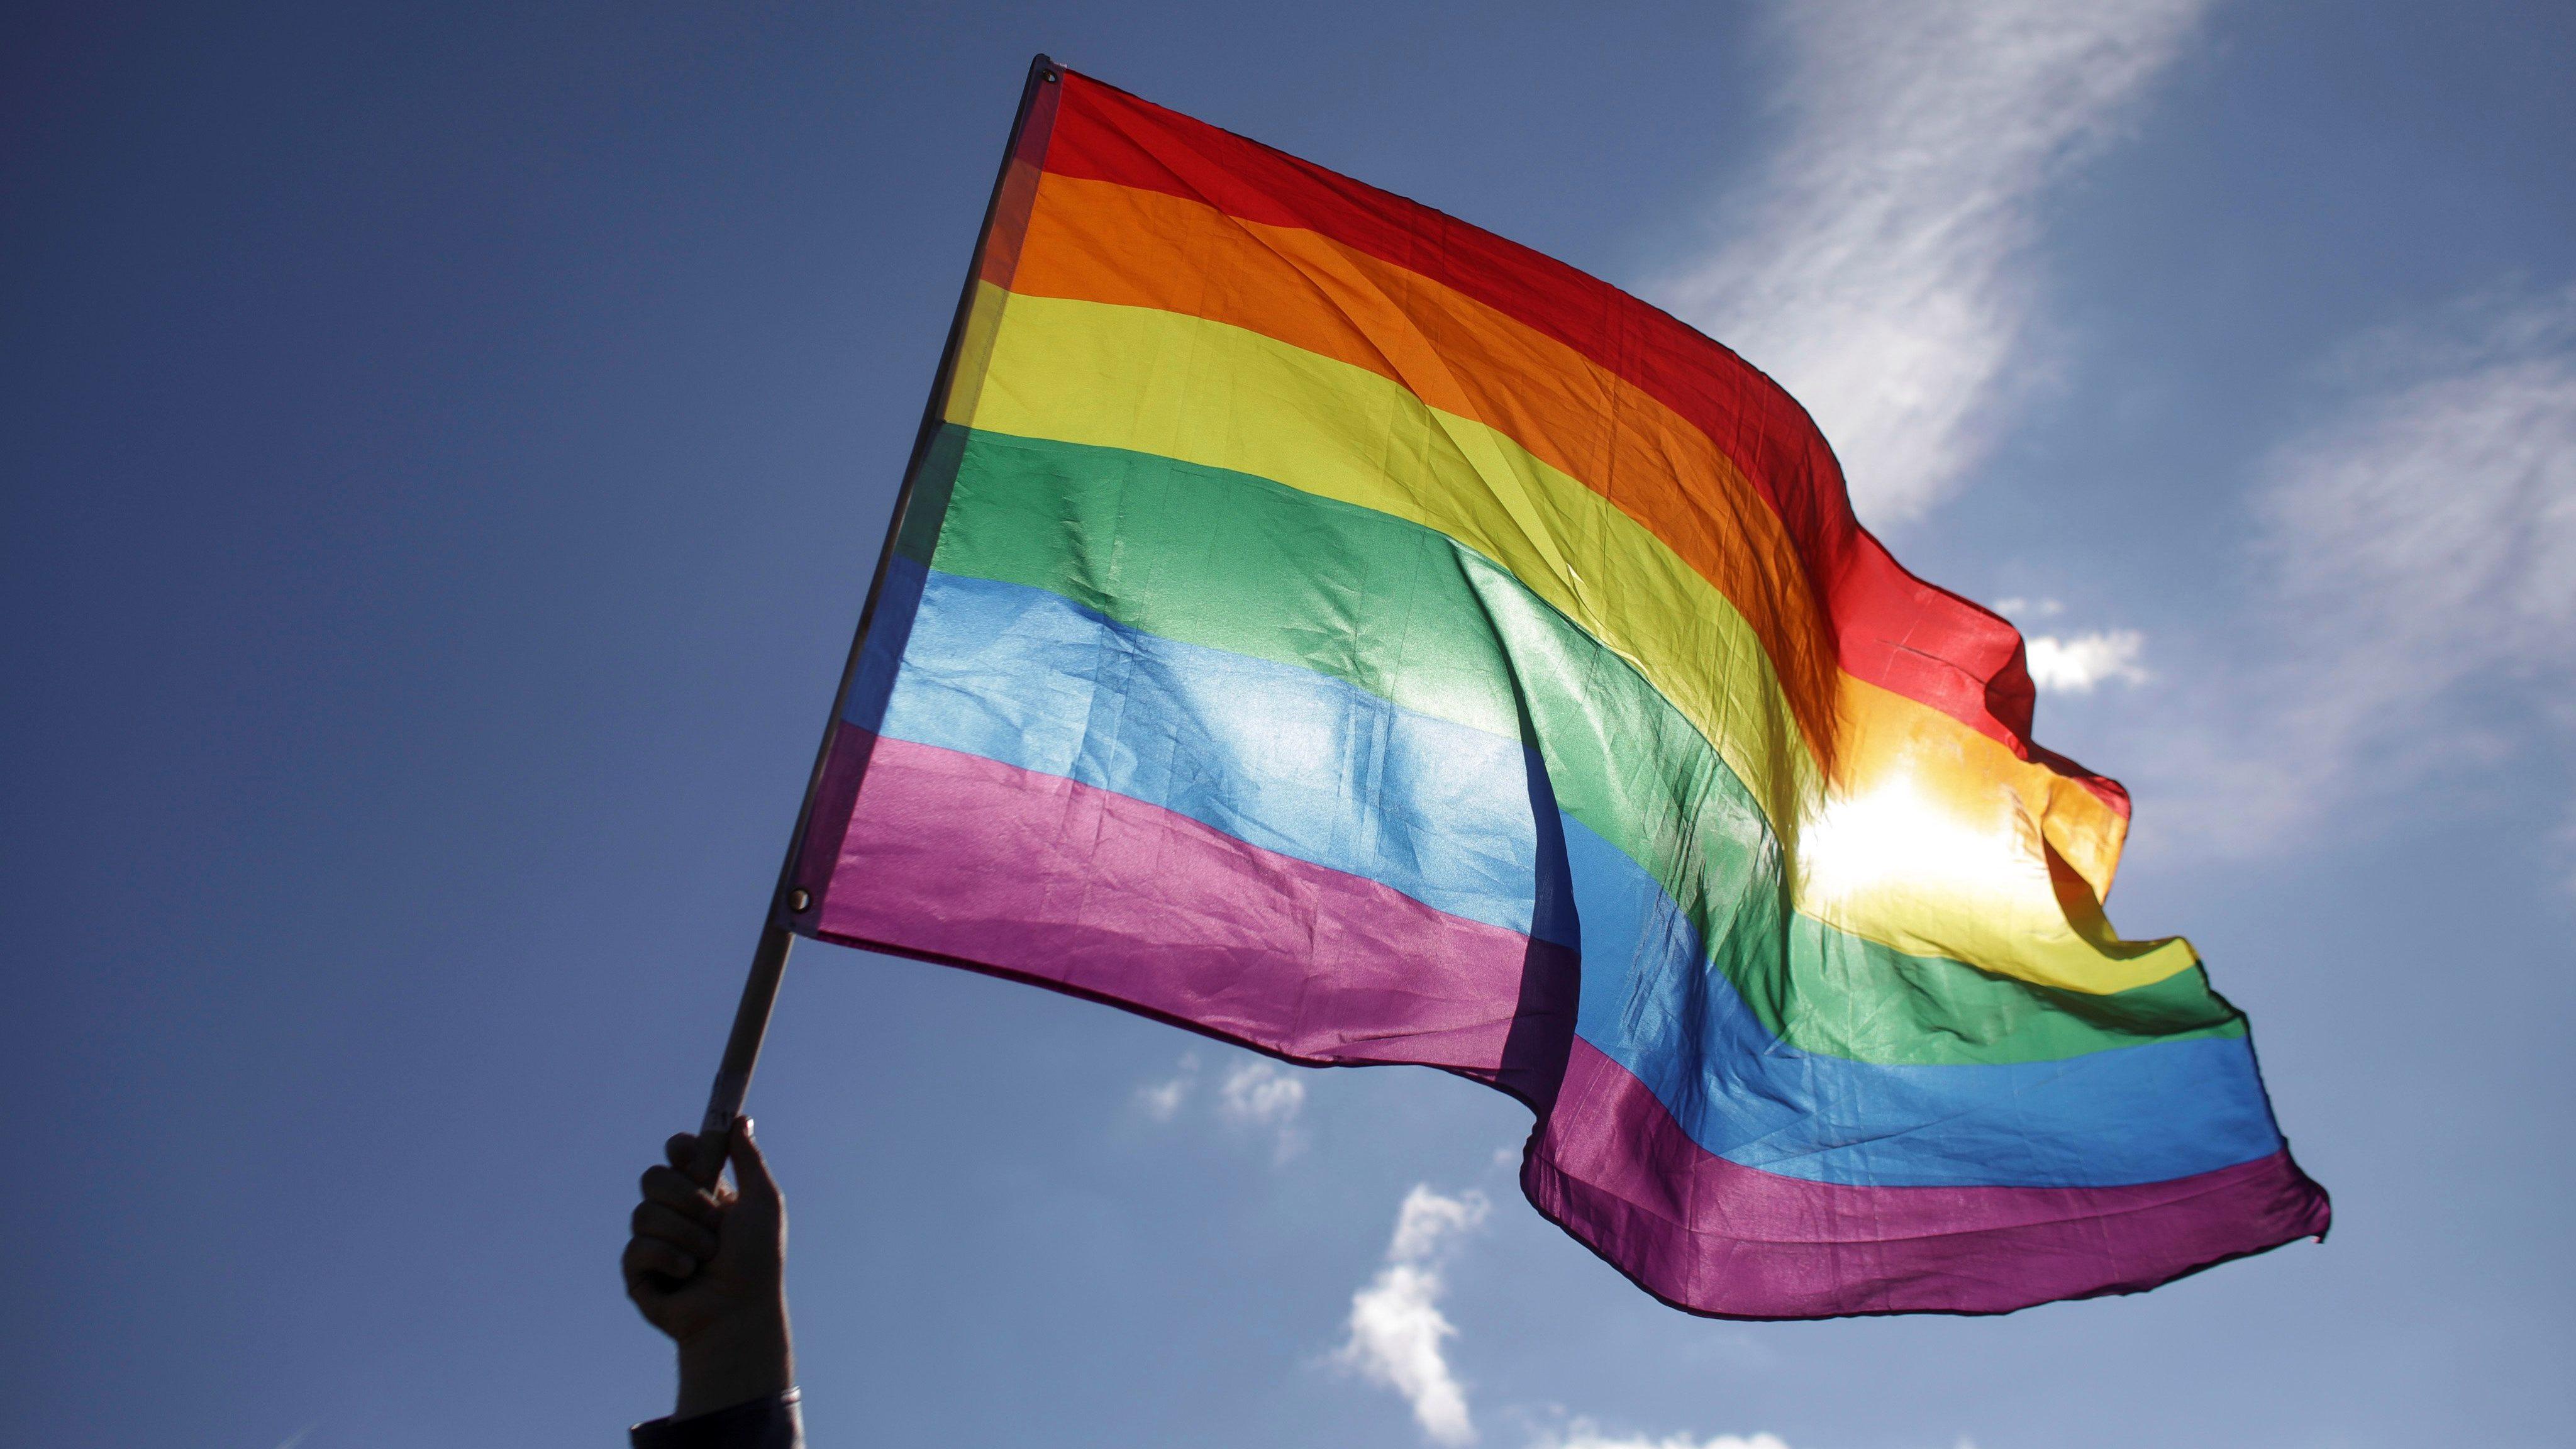 Scotland to teach LGBTQ history and culture at schools